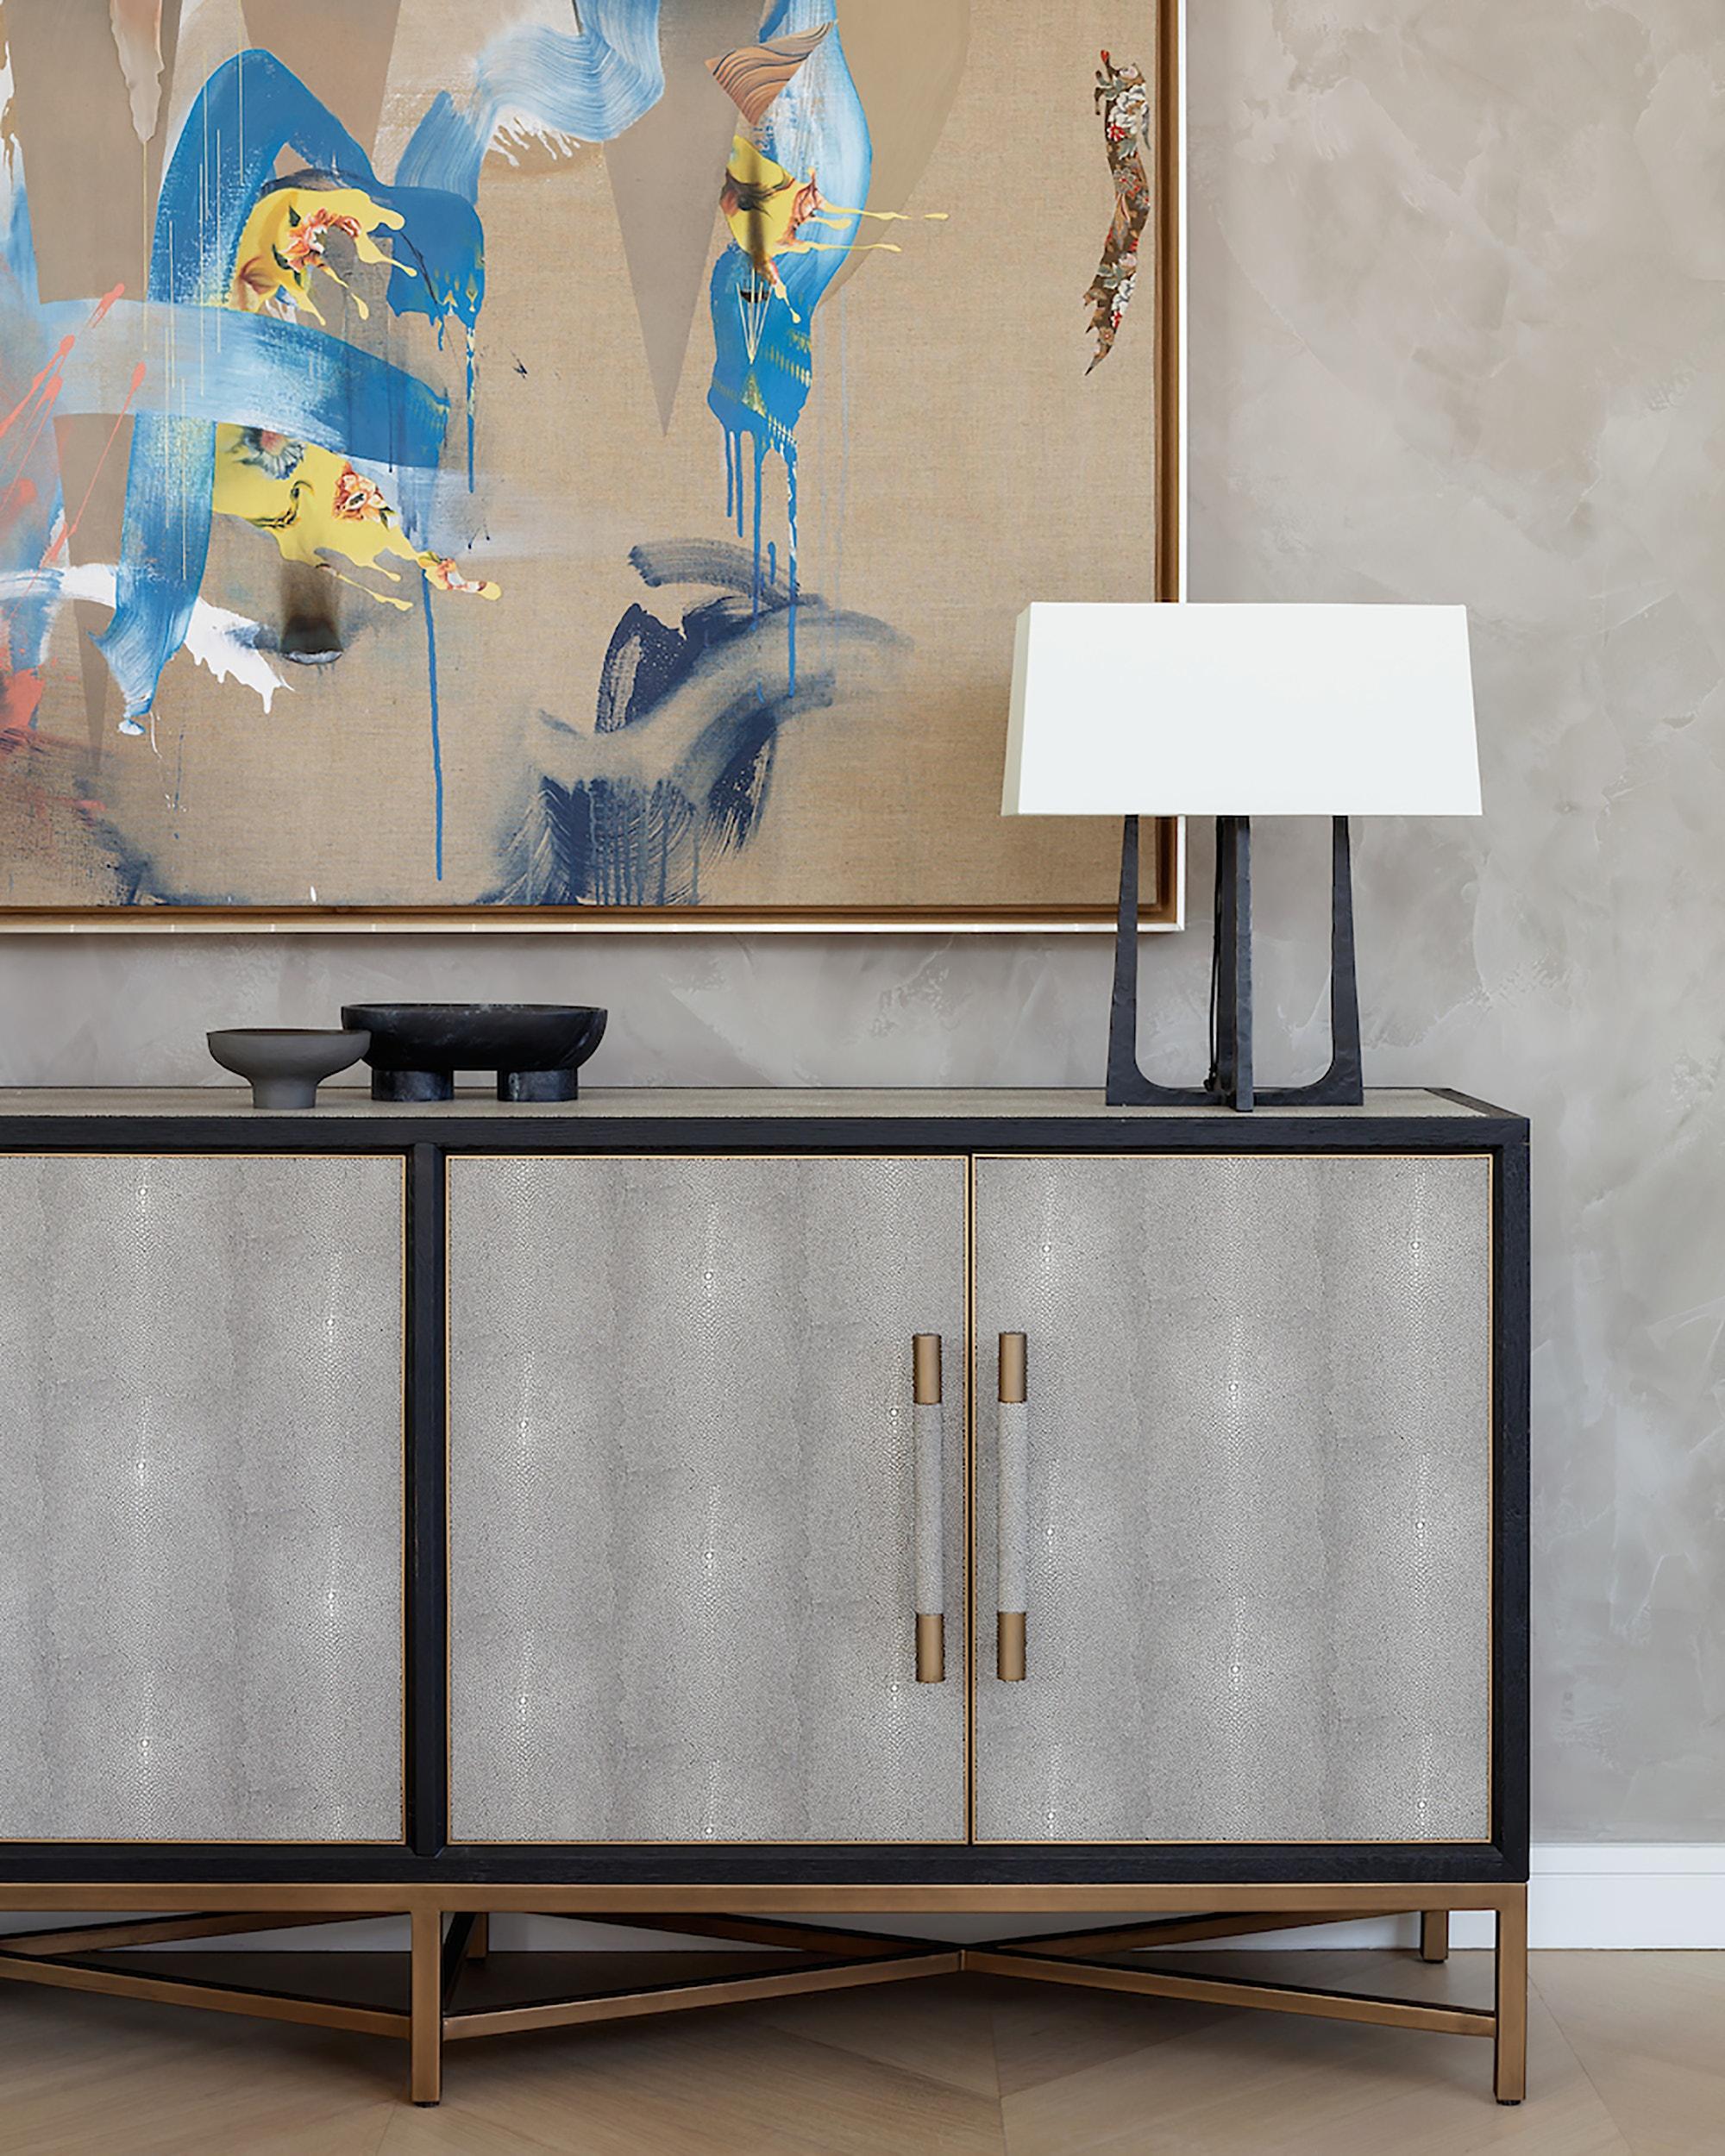 Related-Lantern-House-Model-decor